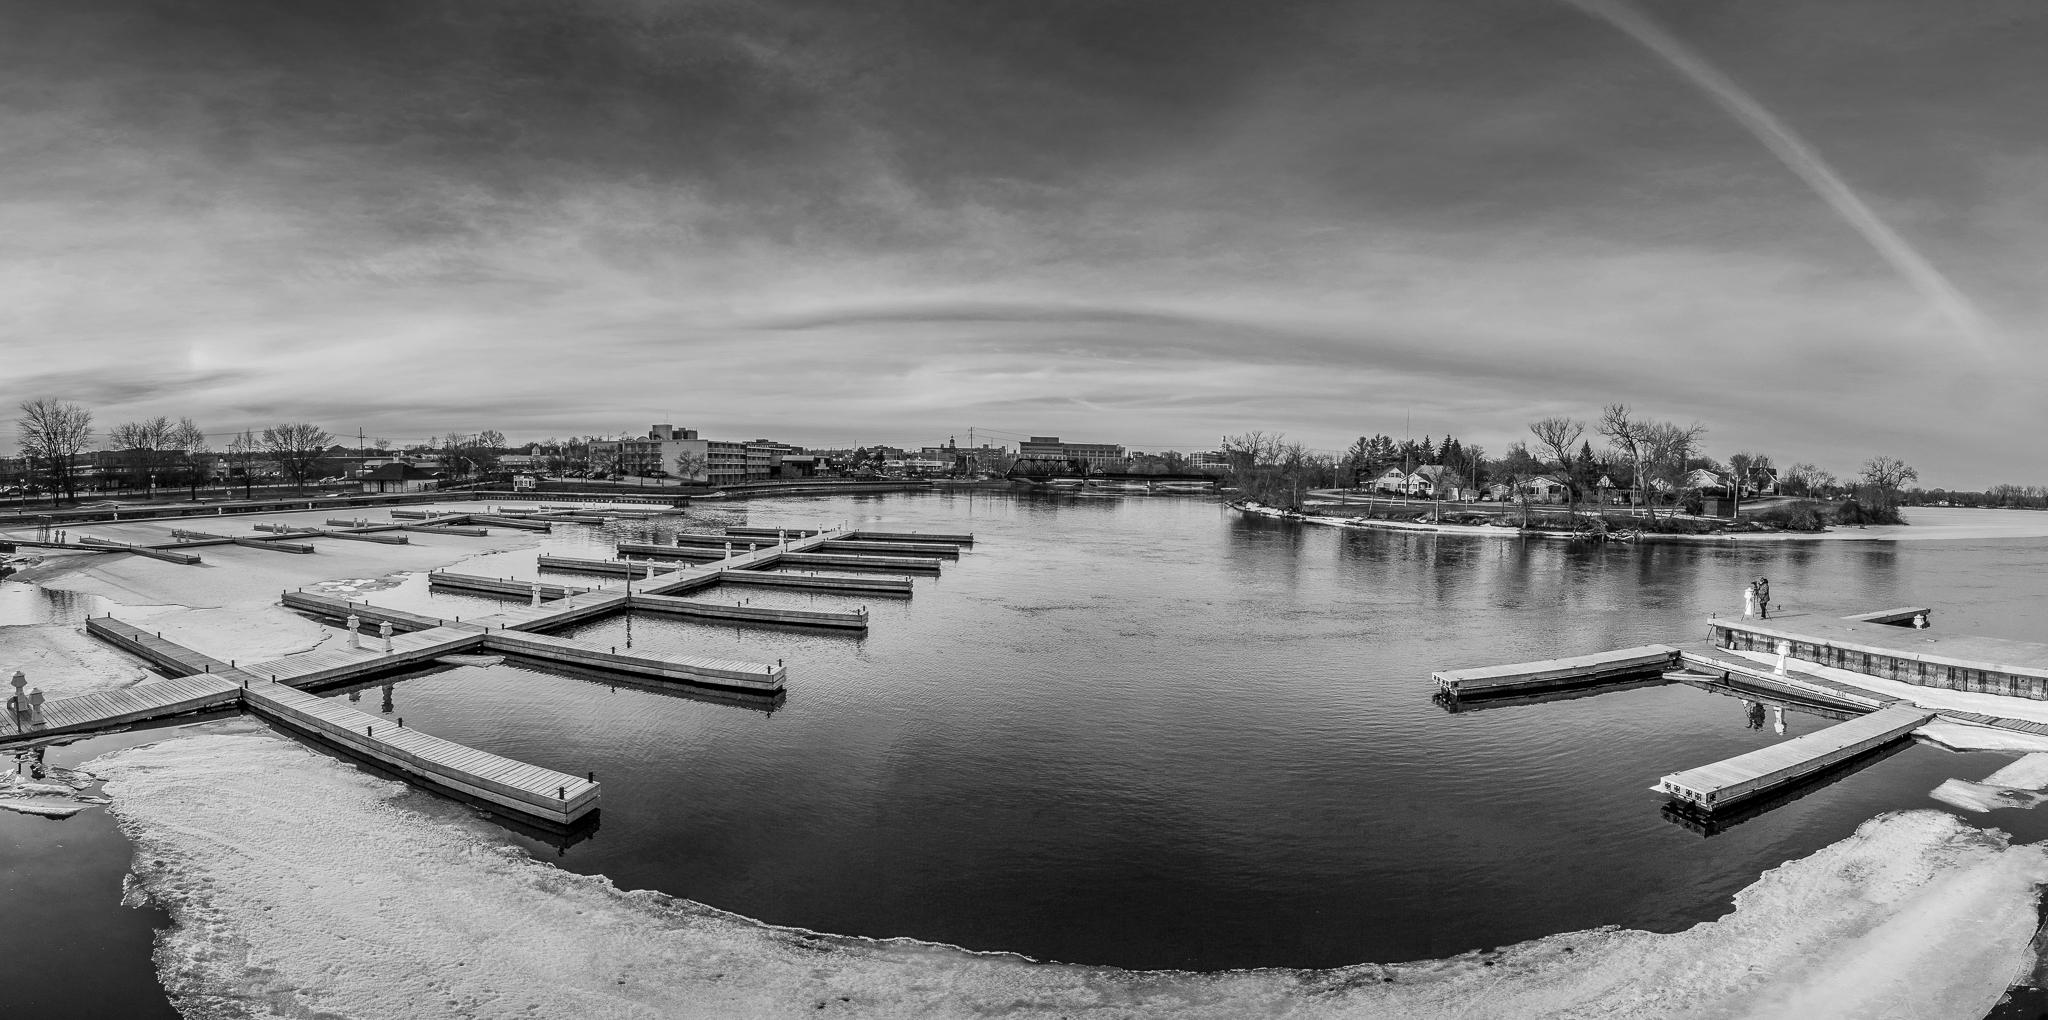 Peterborough Marina